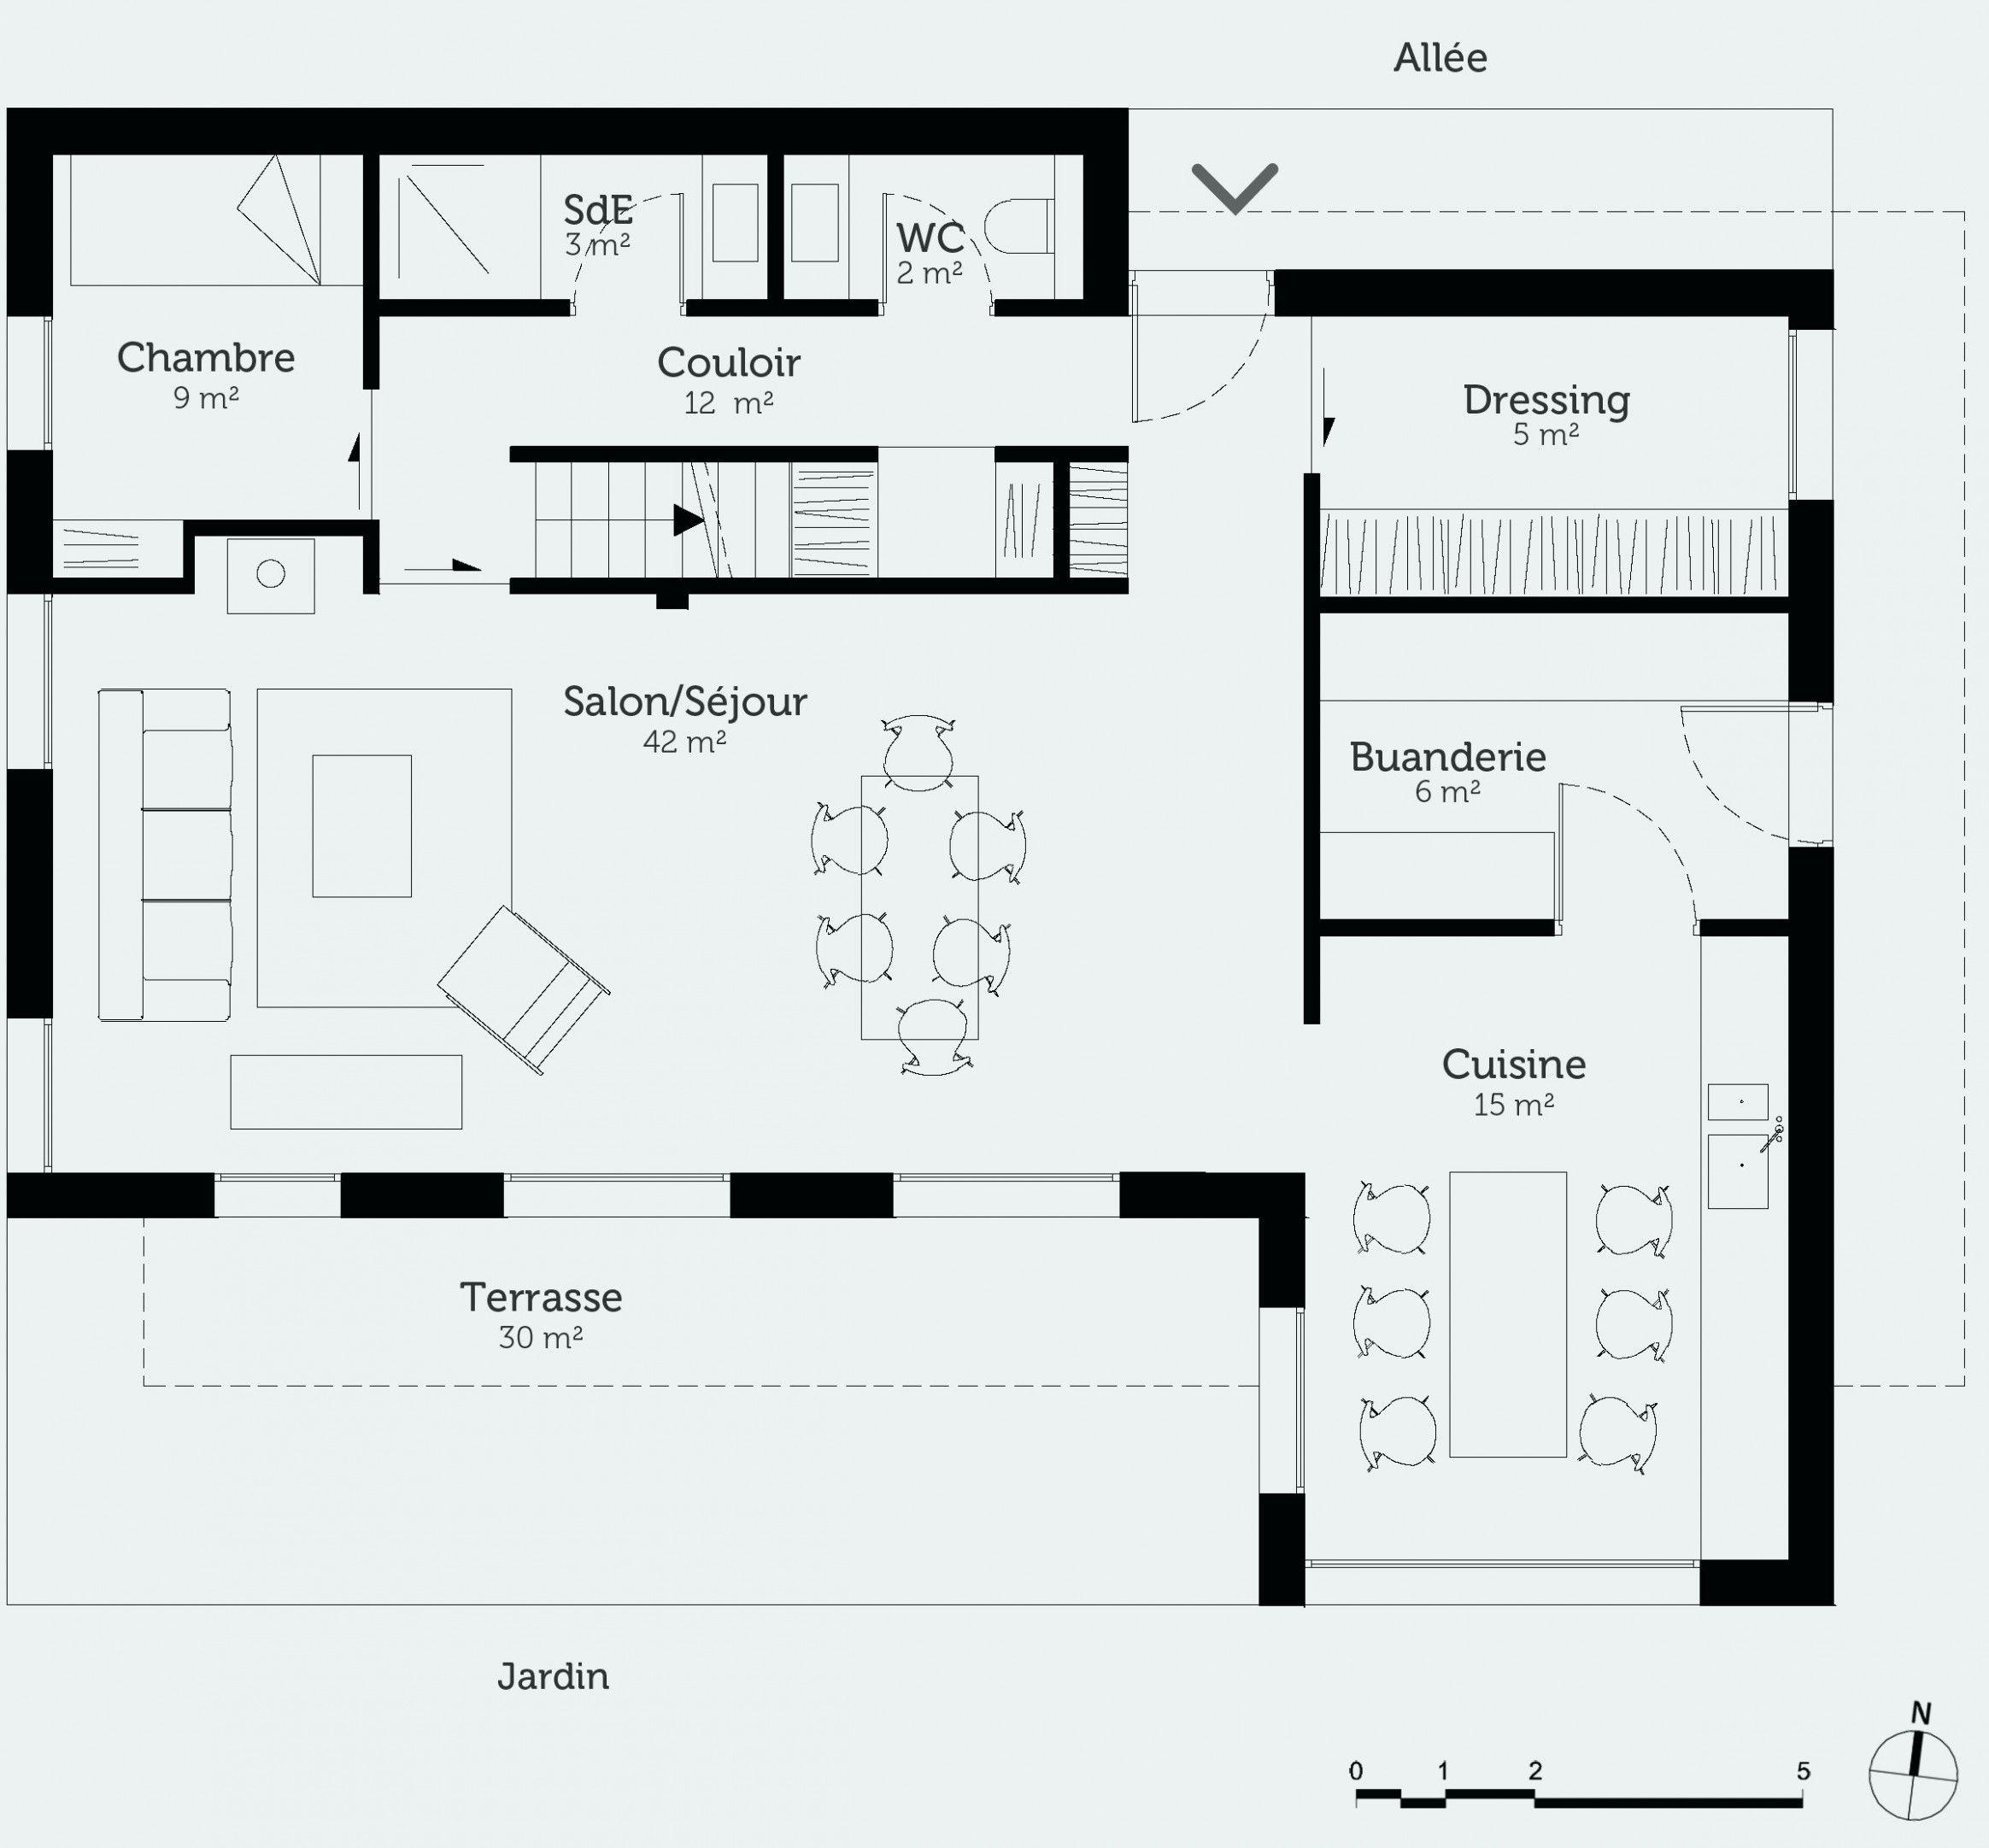 Idee Maison En Longueur   How to plan, House plans, Ground floor